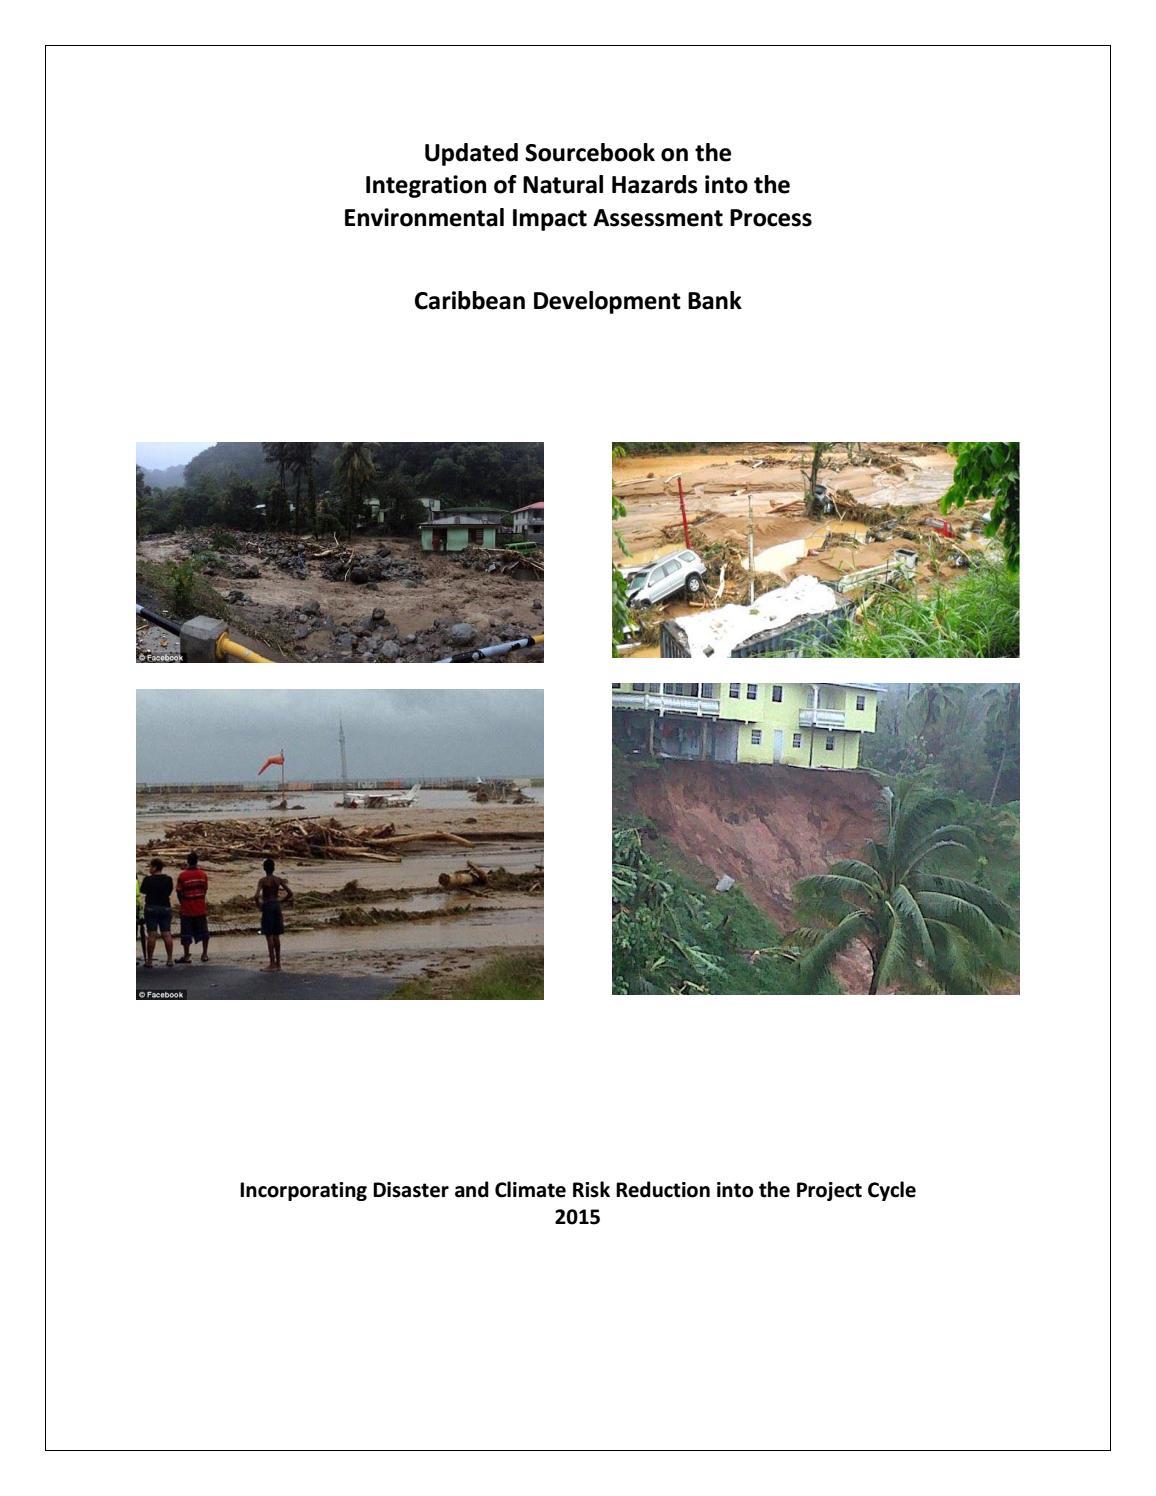 Updated Sourcebook on the Integration of Natural Hazards